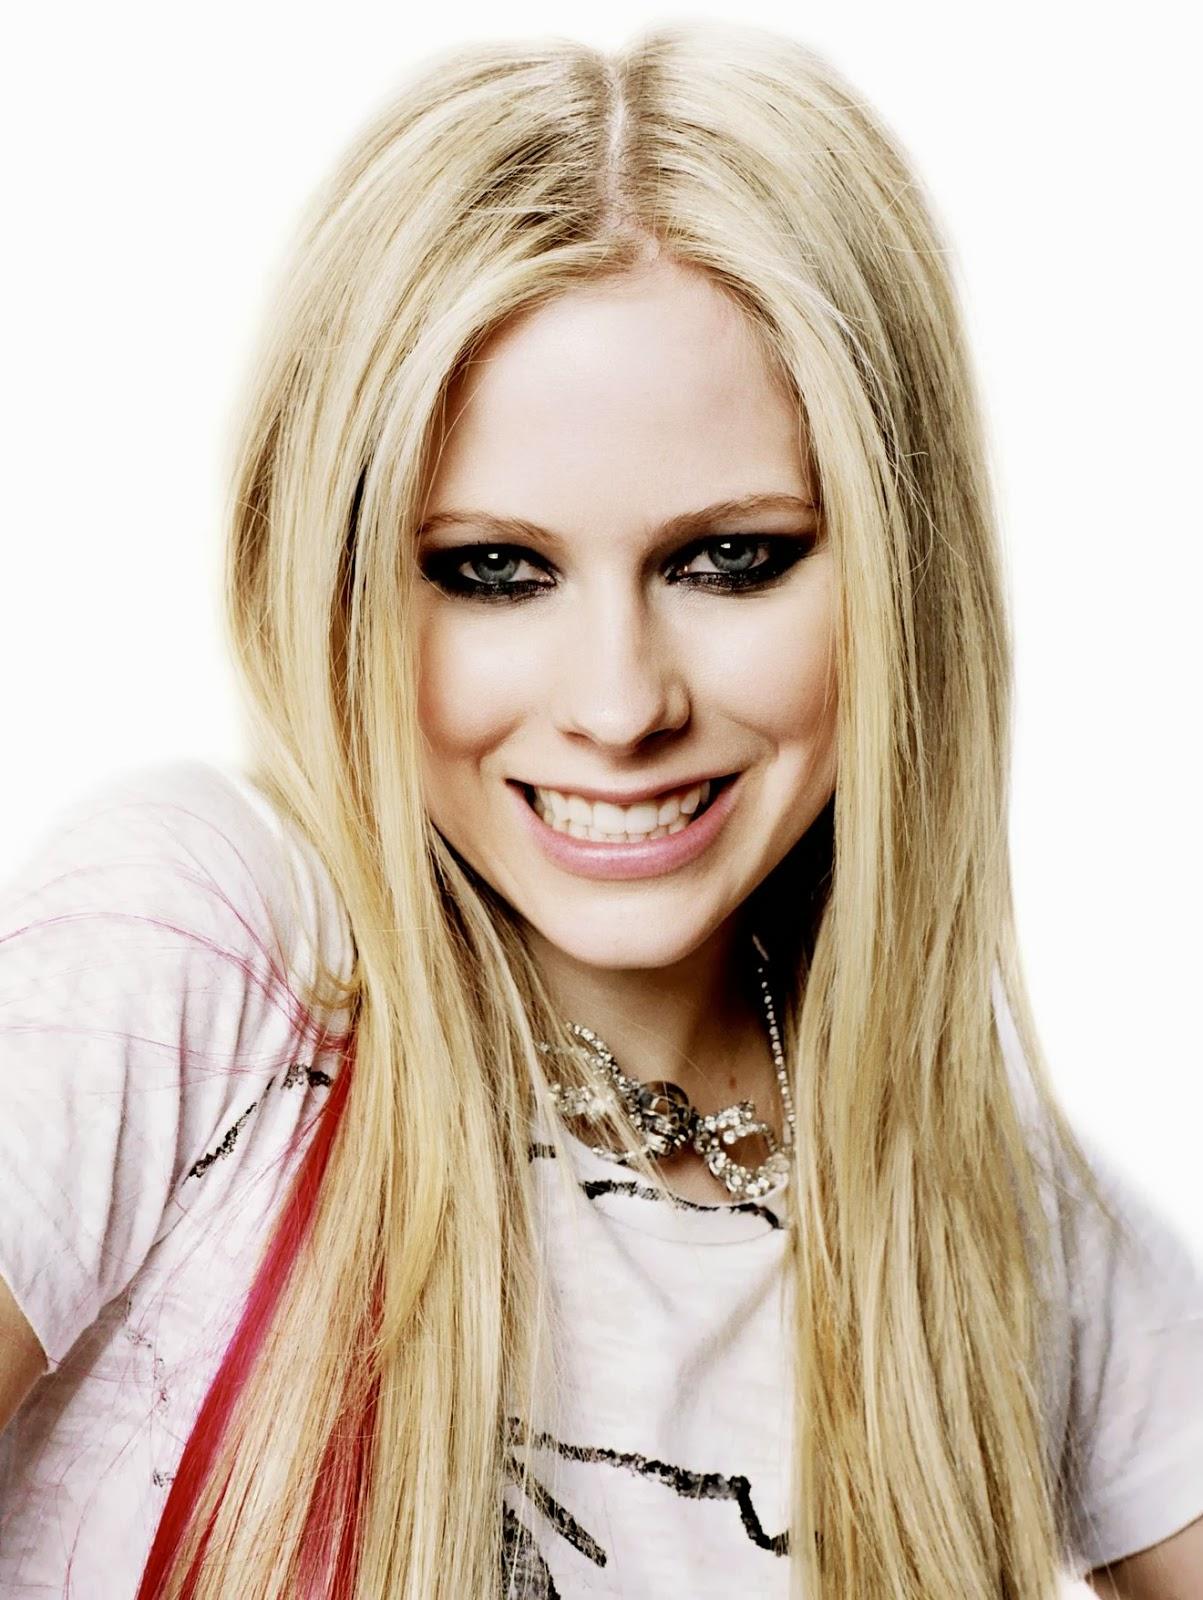 Top Celebrity: Avril Lavigne who is? Avril Lavigne